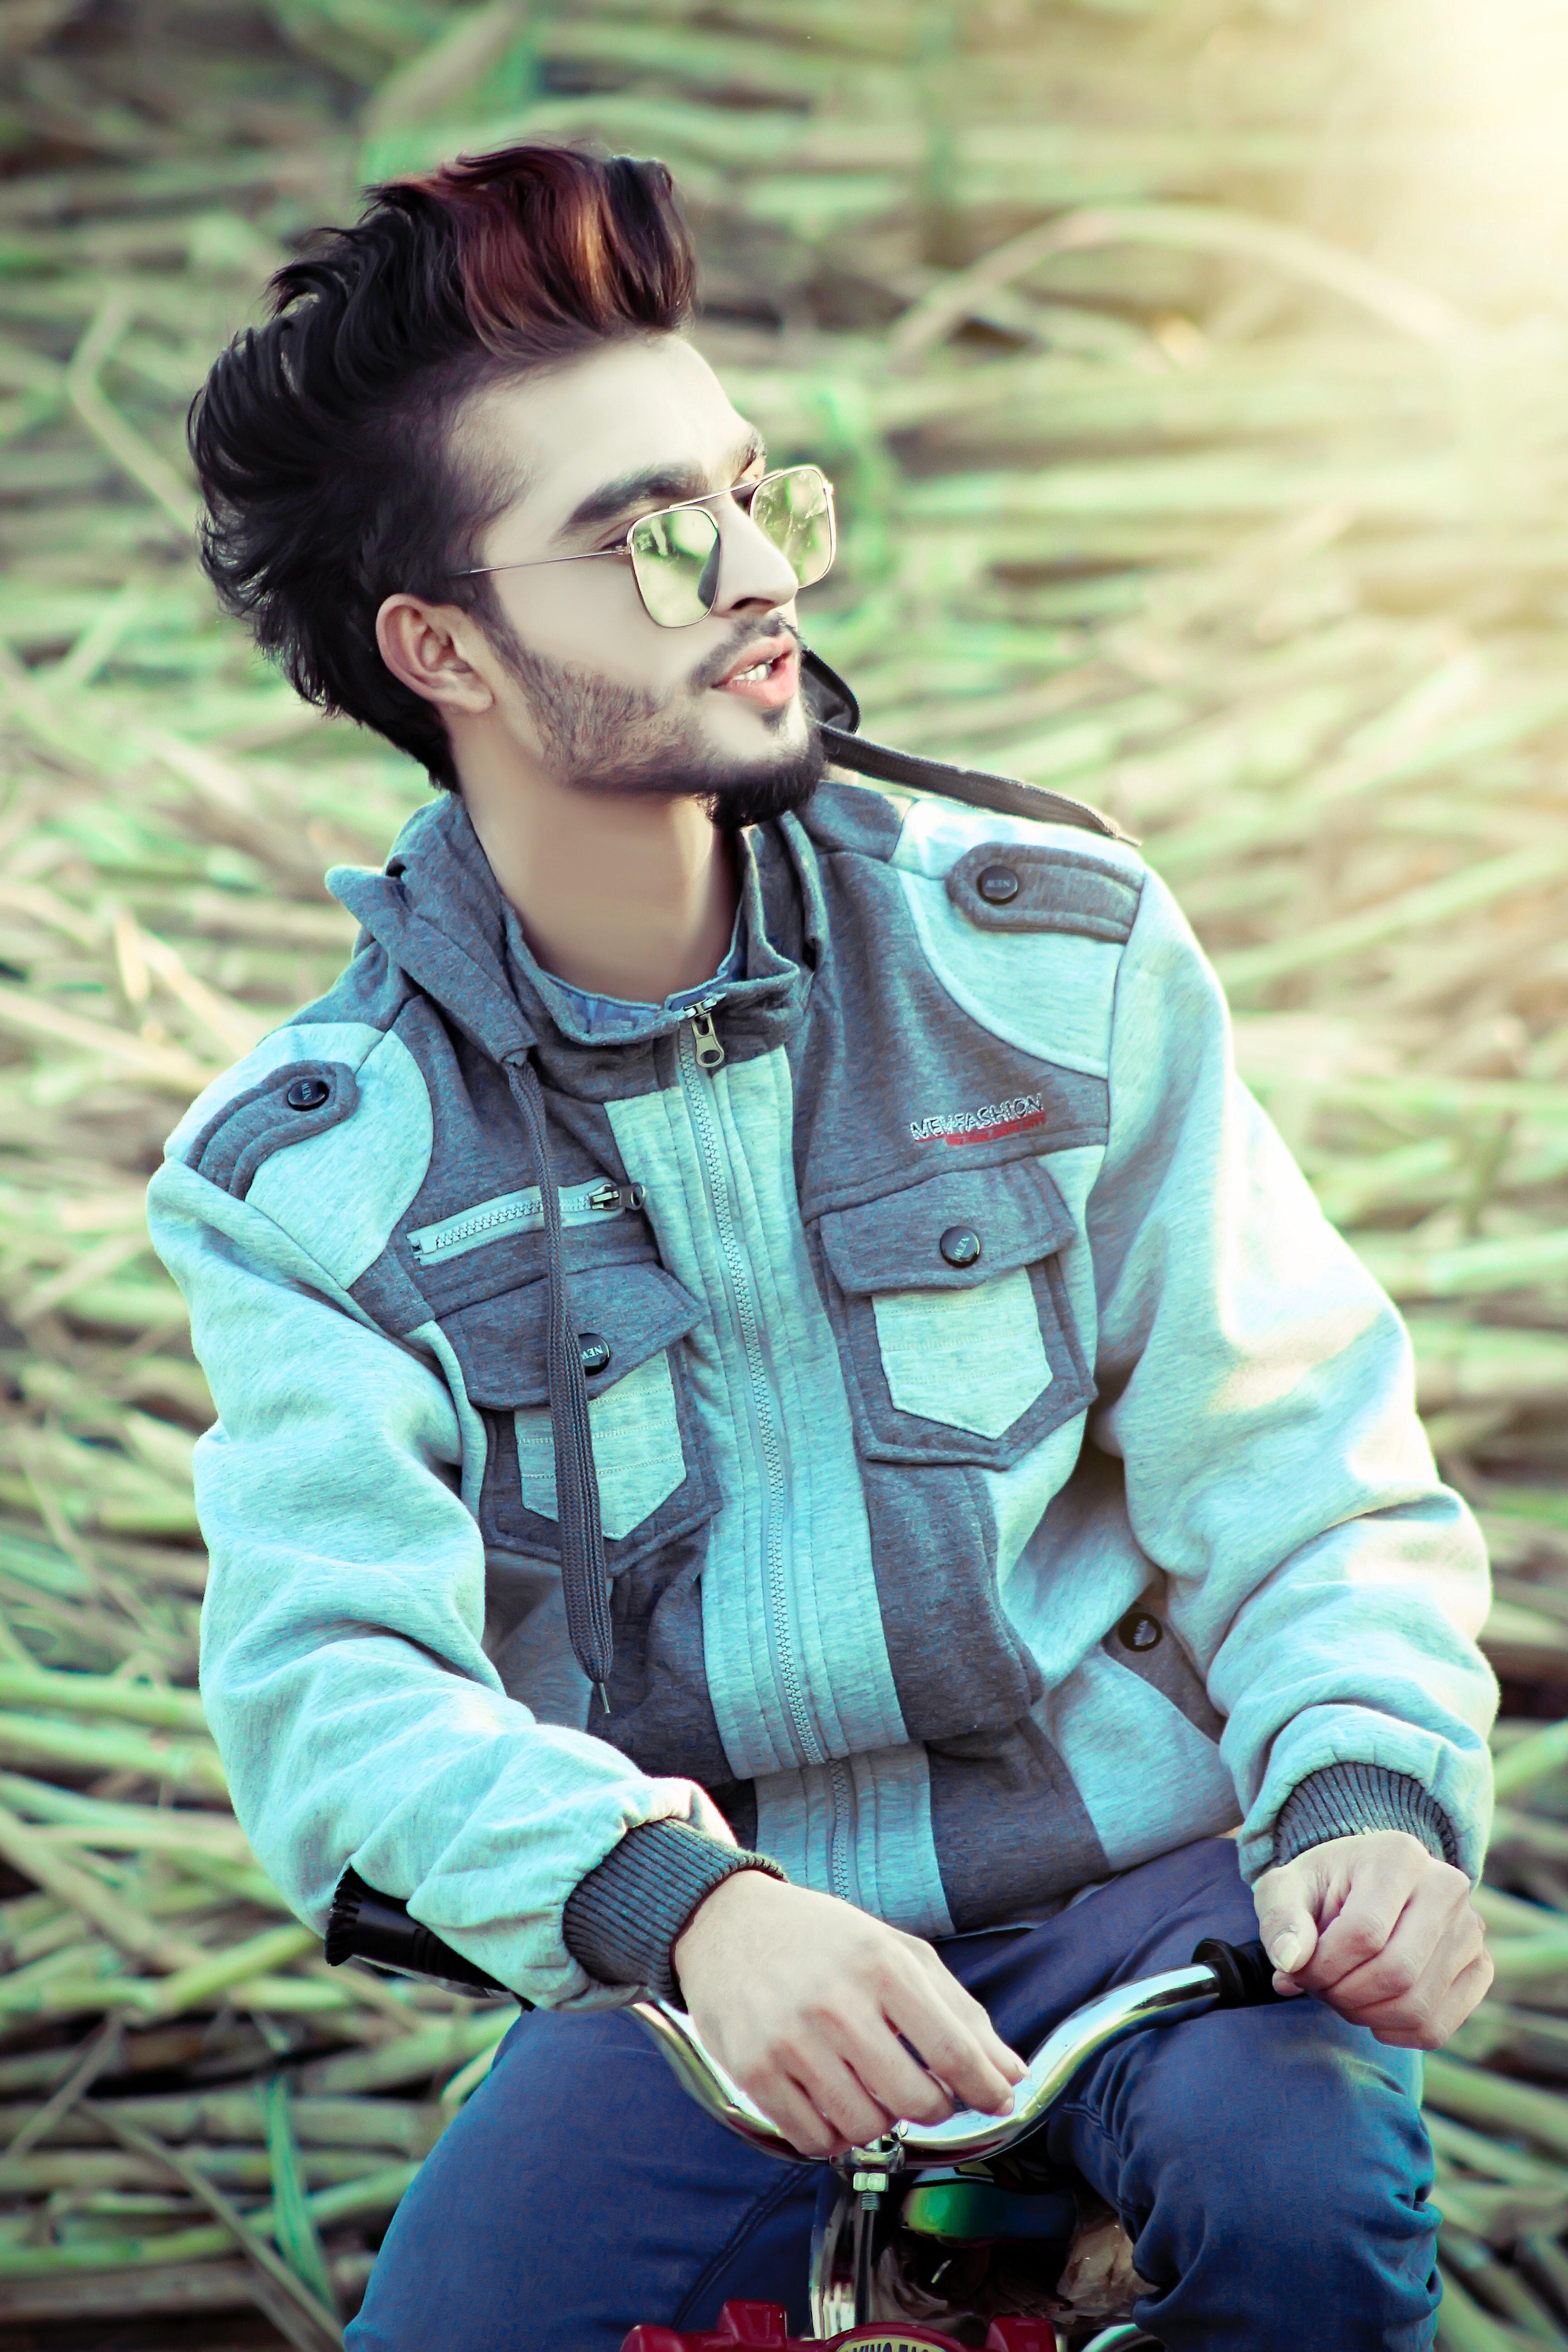 1000+ Beautiful Male Model Photos · Pexels · Free Stock Photos